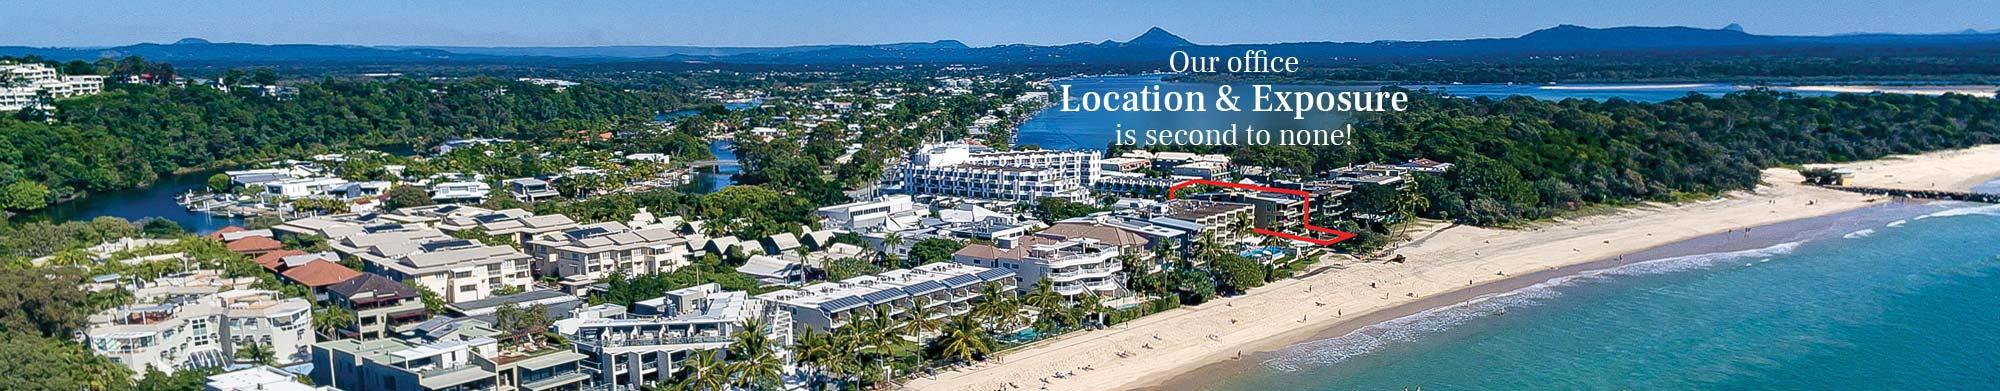 https://assets.boxdice.com.au/richardson-wrench-noosa/attachments/d8e/d73/rwnoosa_beach_location_richardson_wrench_01.jpg?80e354b5dd3e1833d4885a8c7f0b7c44